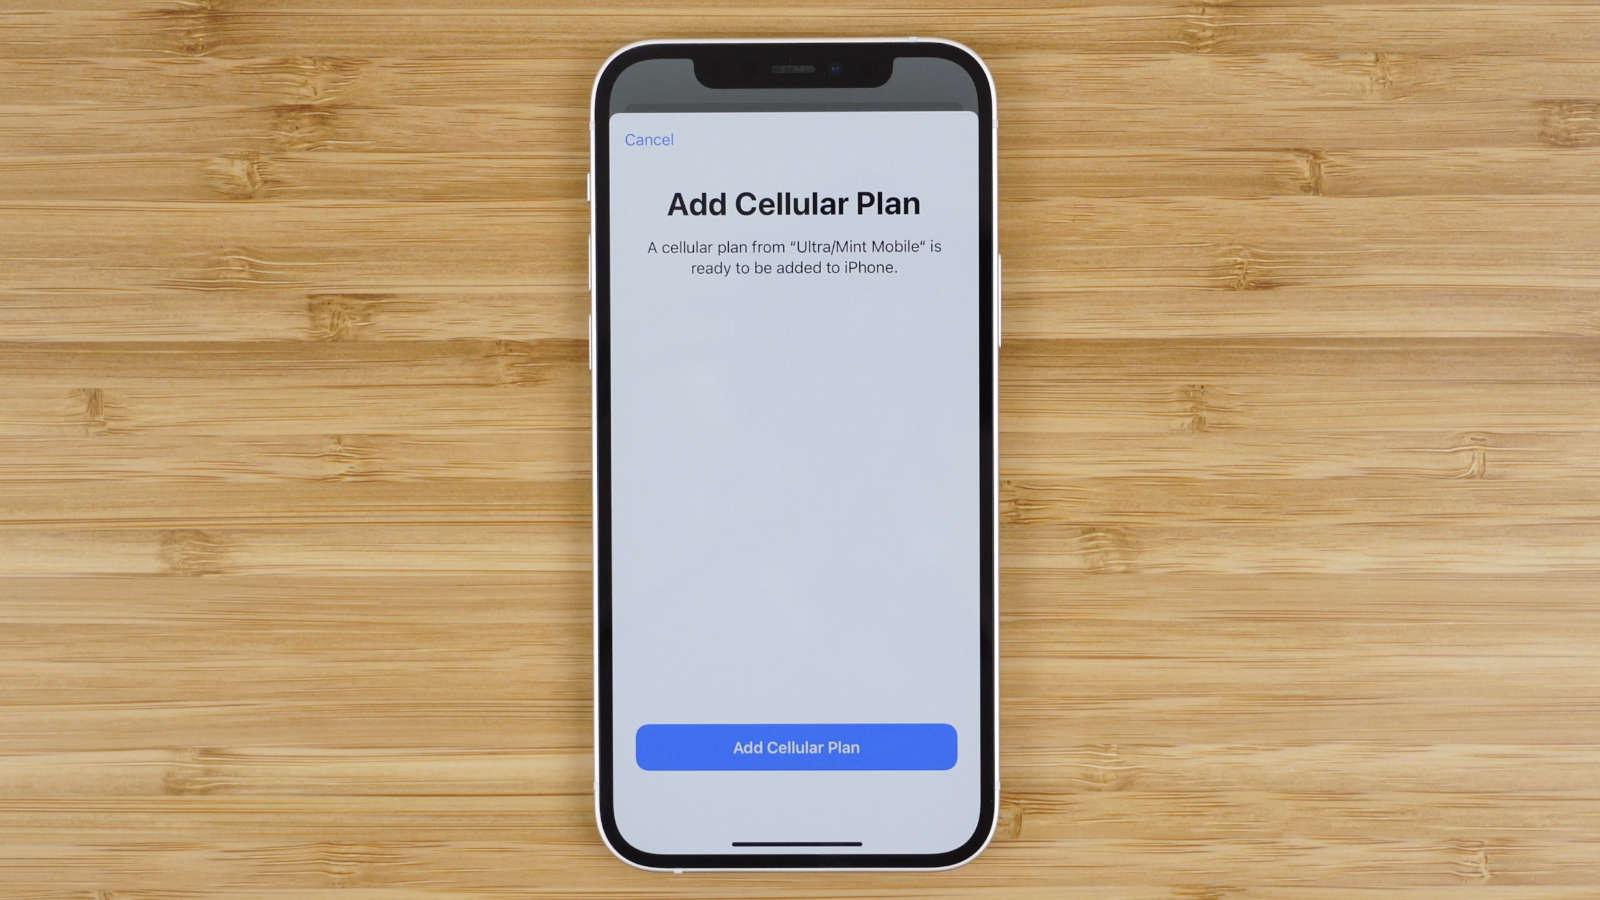 add cellular plan using eSIM on iPhone